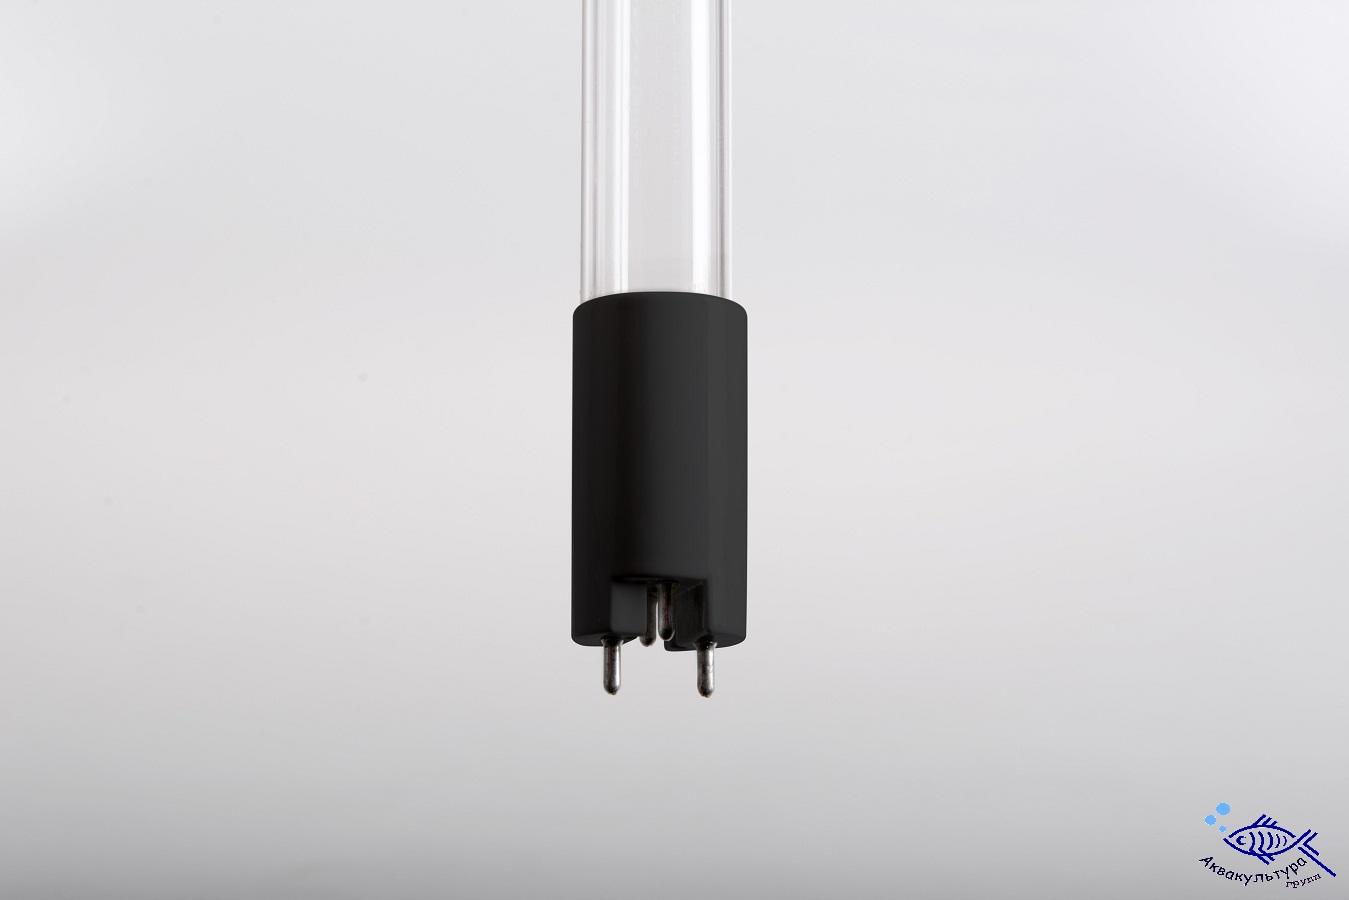 УФ-лампы UNIT SPECIFIC LAMPS